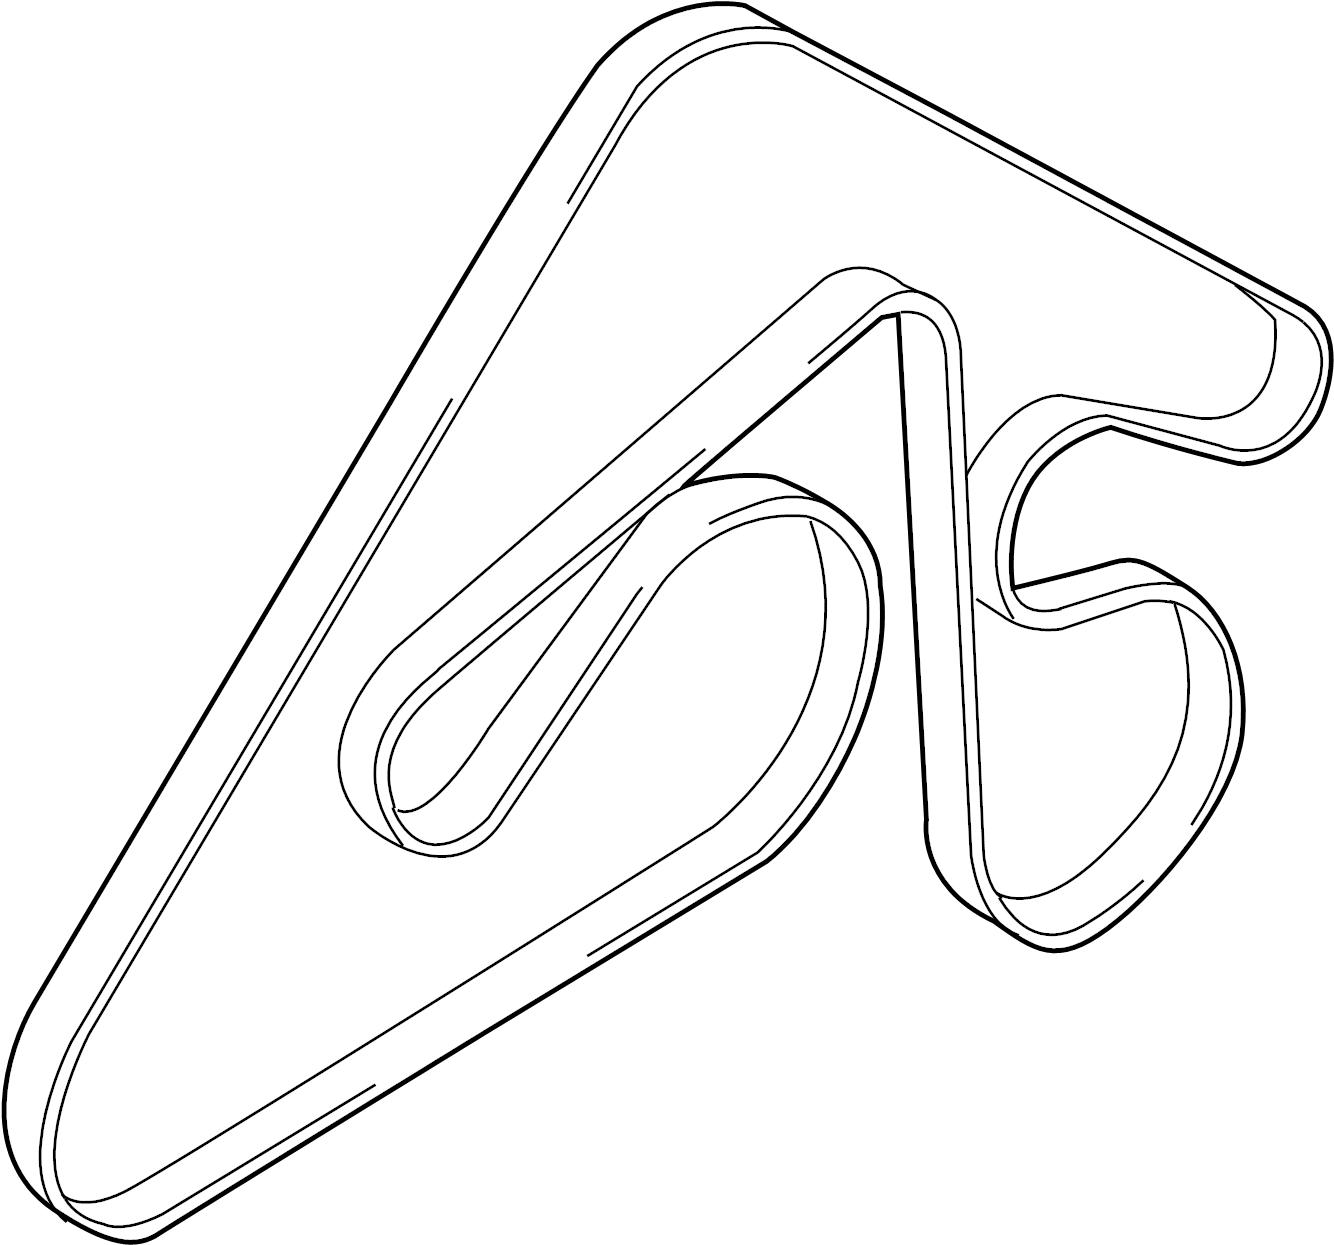 252123f360 - hyundai ribbed belt